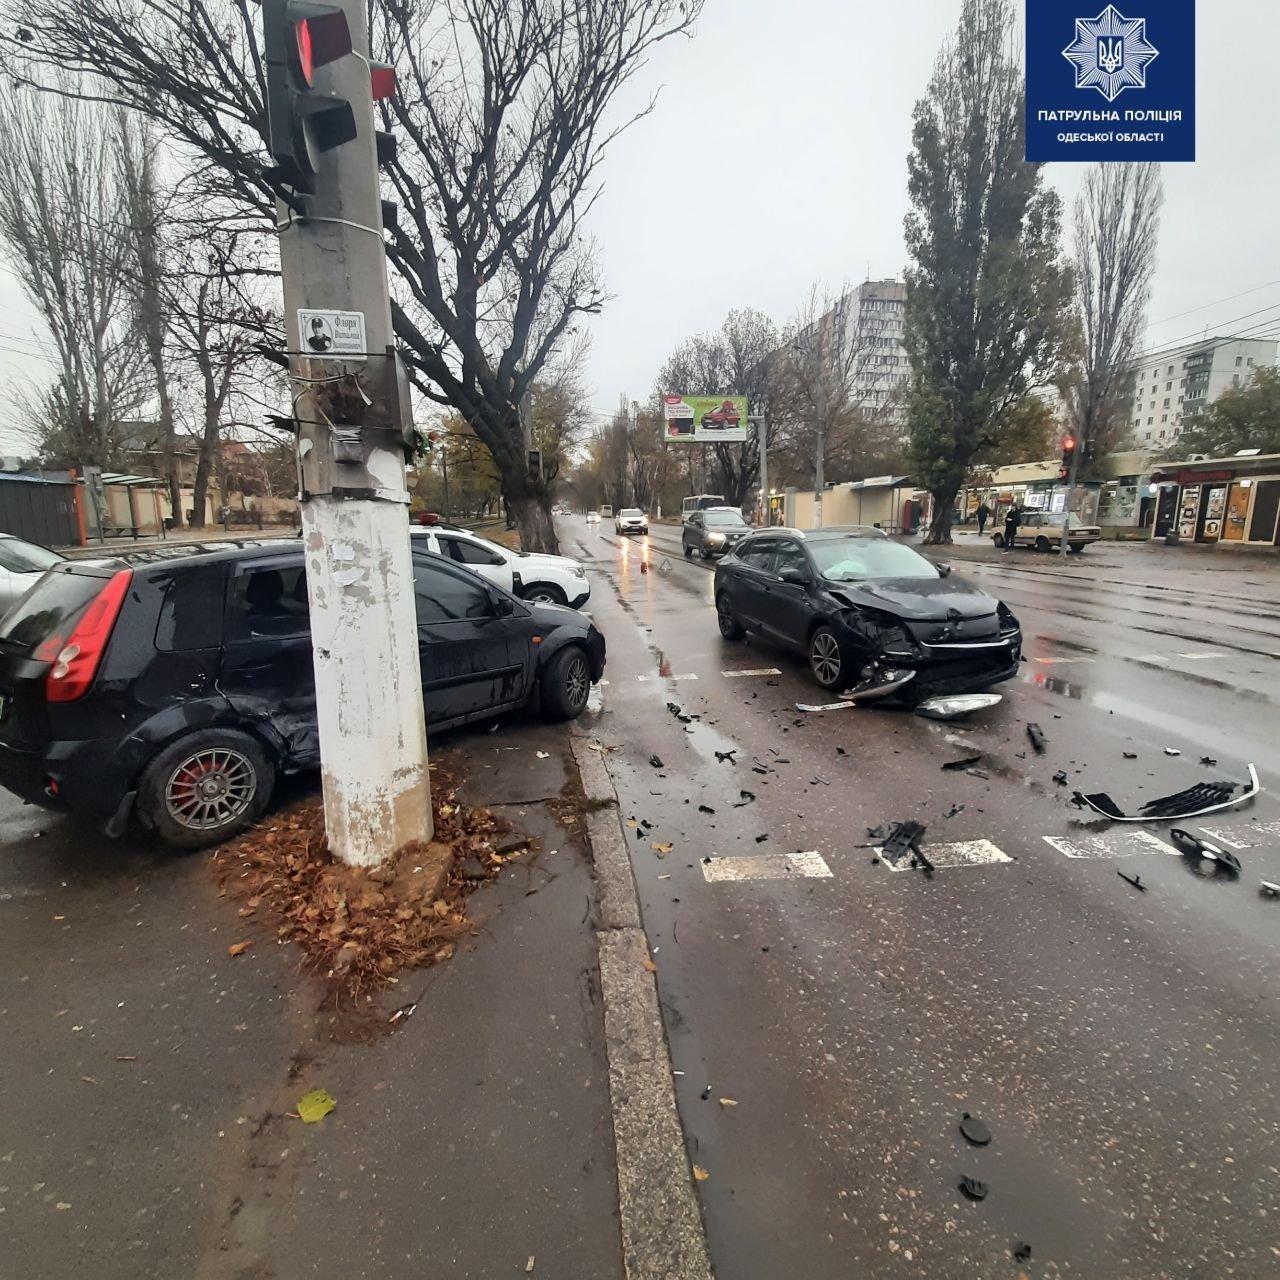 ДТП в Одессе: от удара машину выкинуло на тротуар, - ФОТО, фото-1